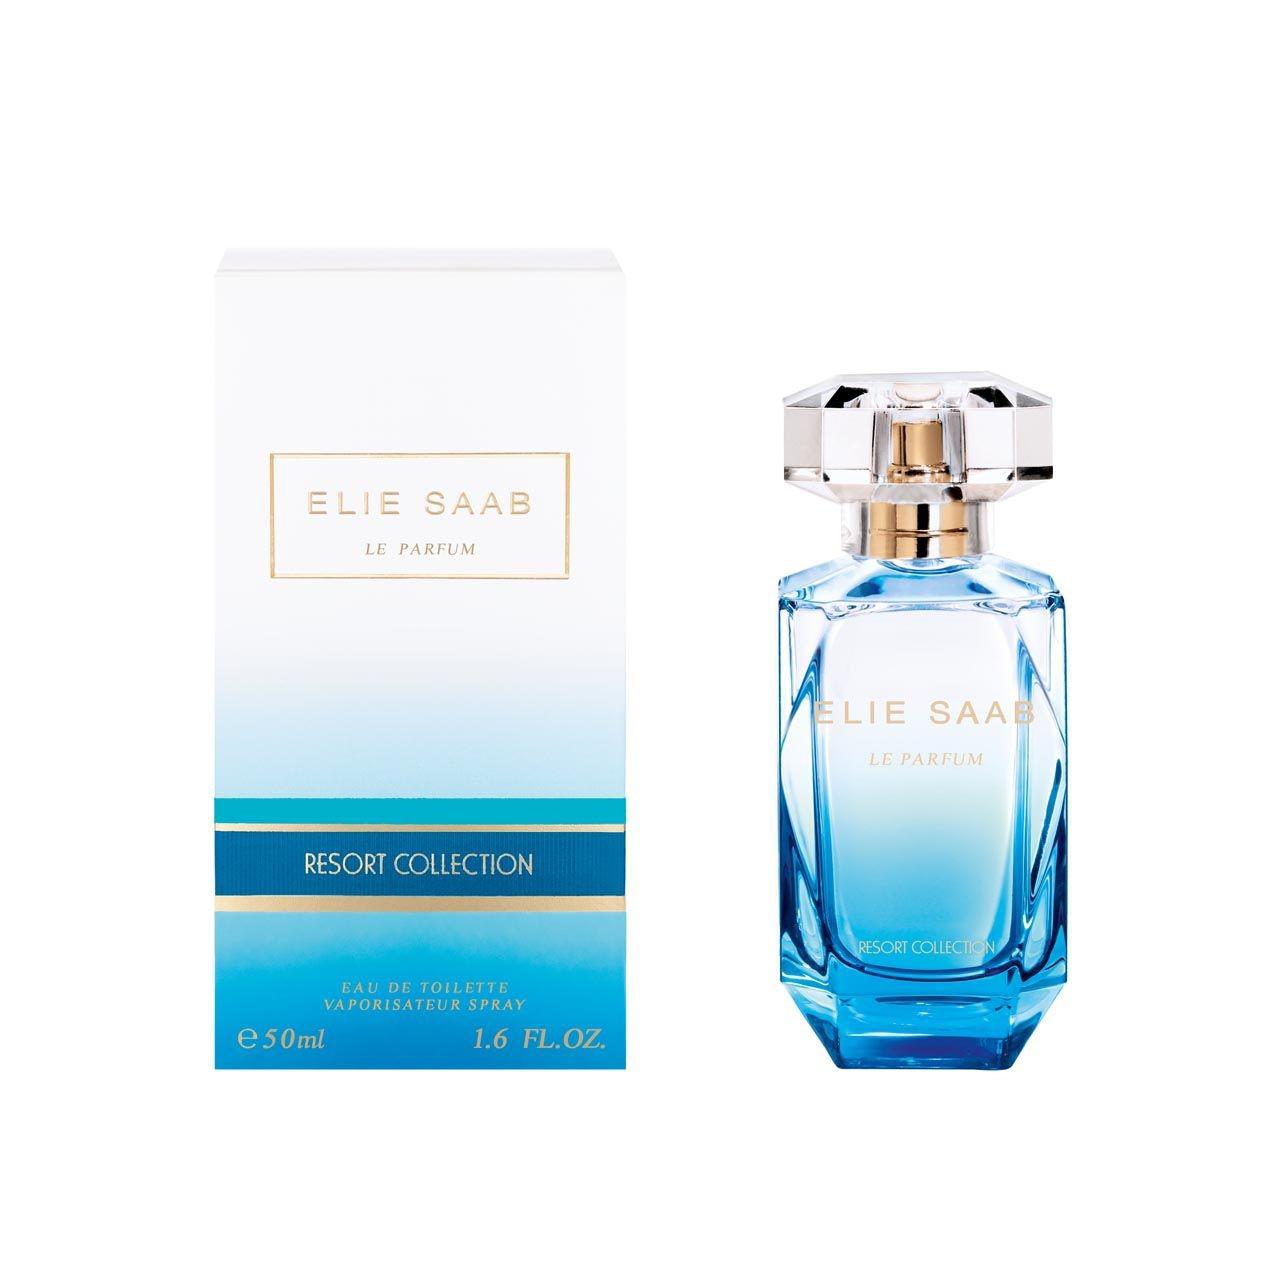 Apa de toaleta Elie Saab Le Parfum Resort Collection